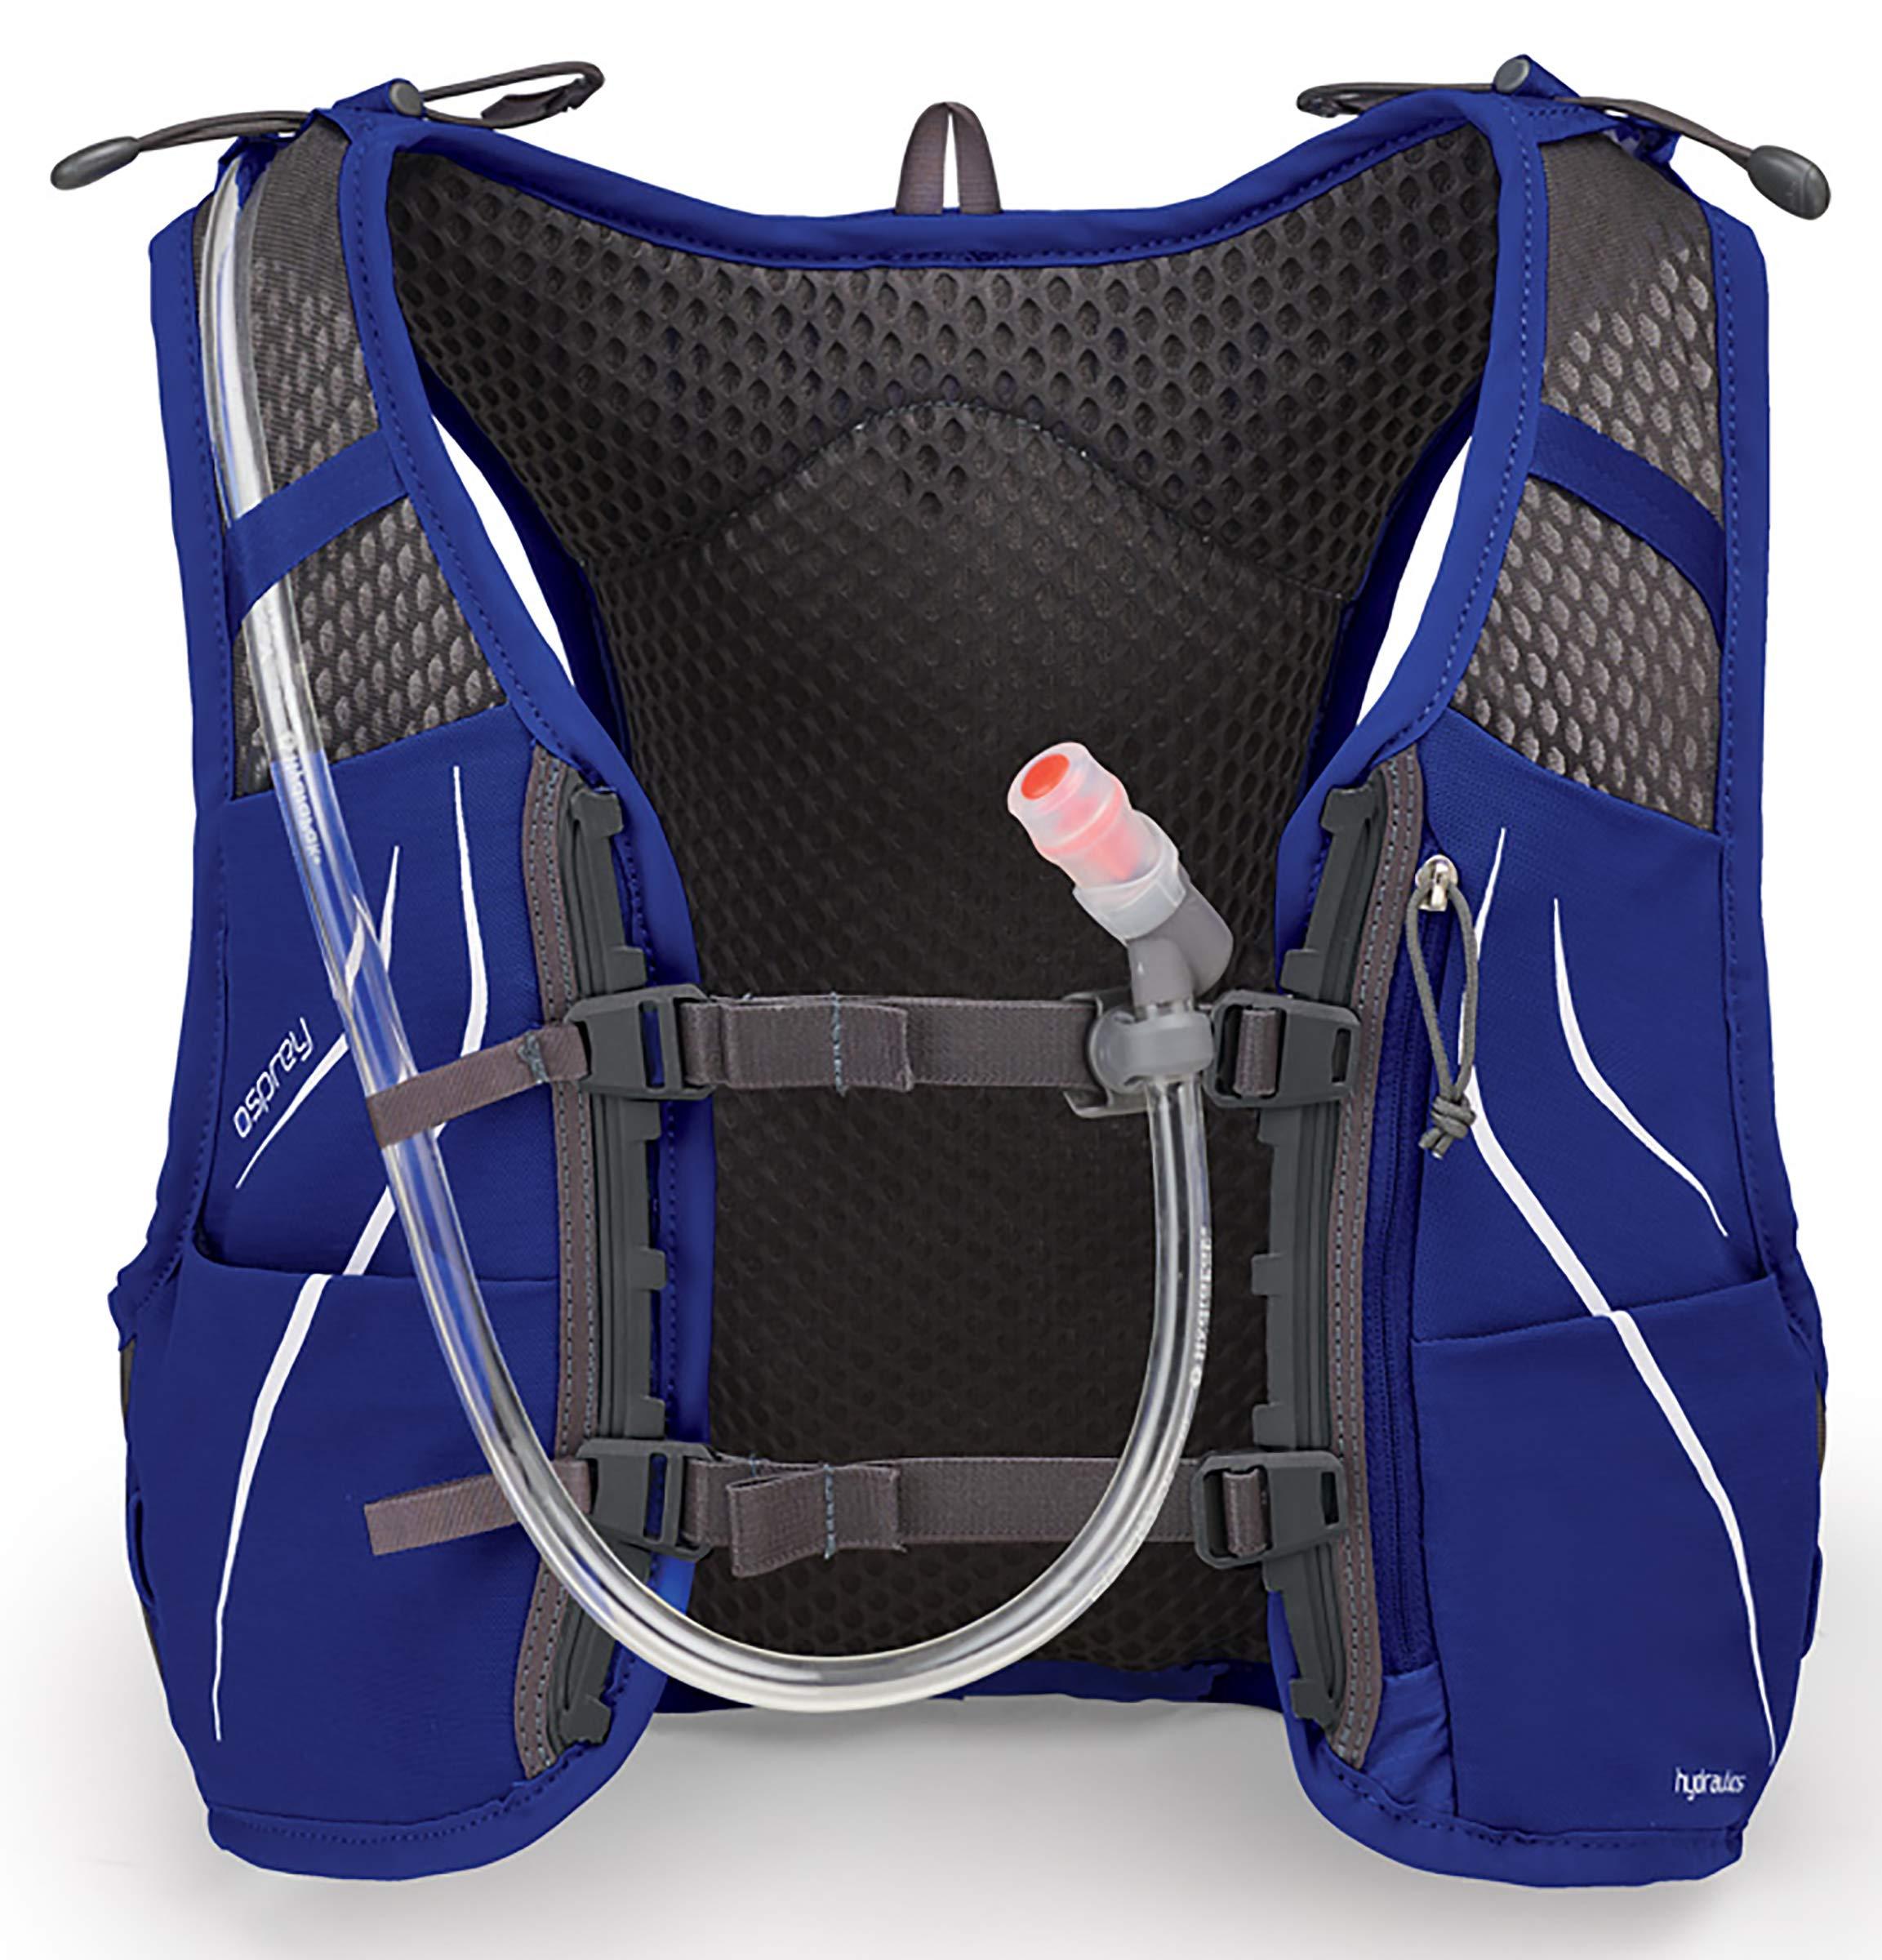 Osprey Packs Dyna 1.5L Women's Running Hydration Vest, Purple Storm, WS/Medium by Osprey (Image #2)